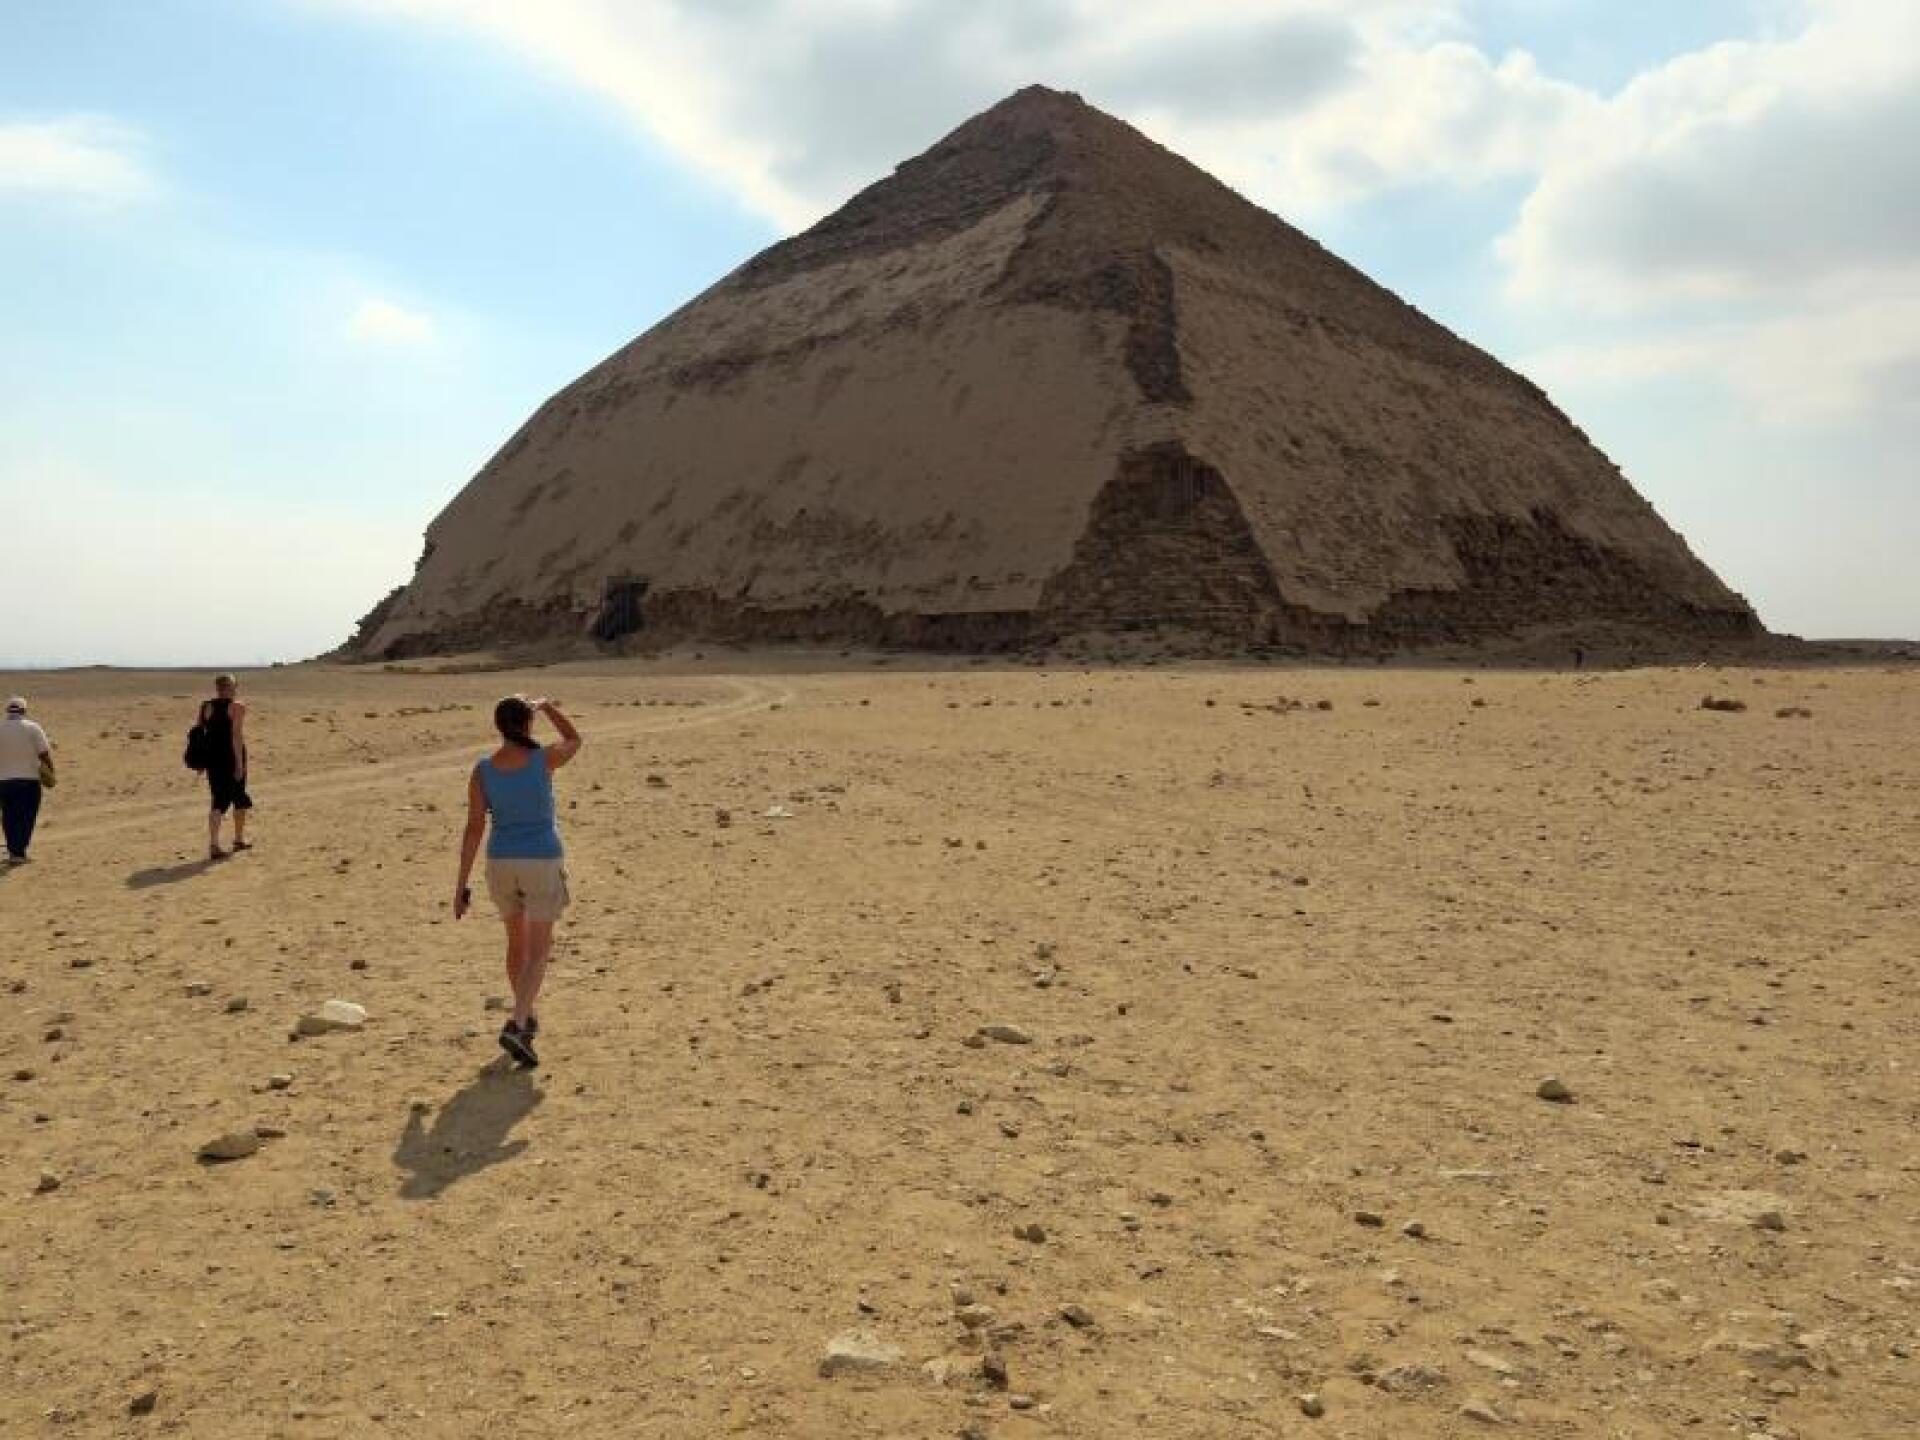 Knickpyramide von Pharao Snofru